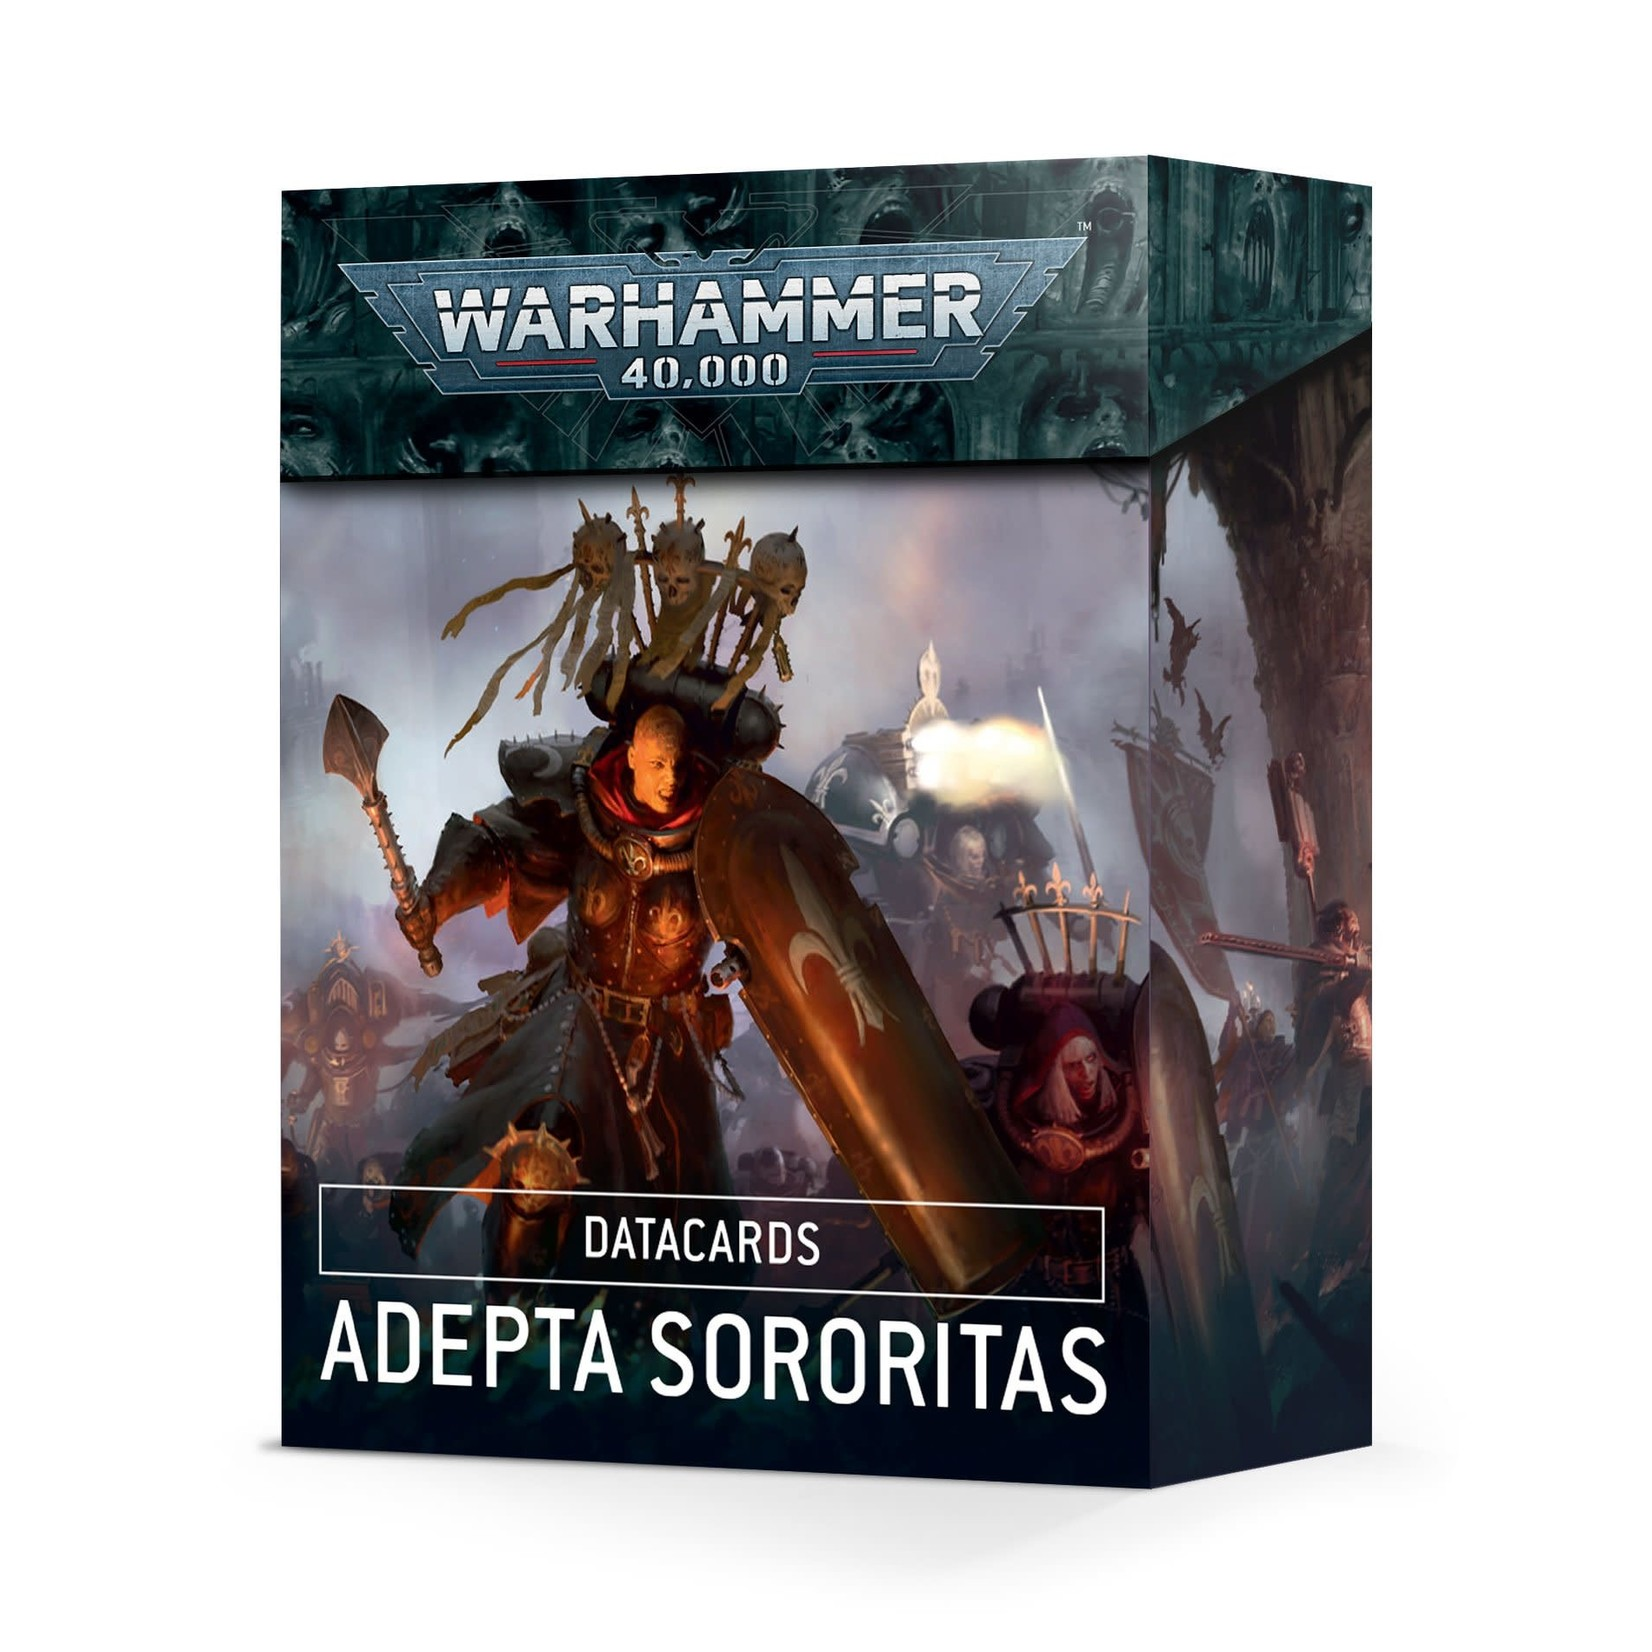 Games Workshop Warhammer 40k: Adepta Sororitas - Datacards (9th Ed)